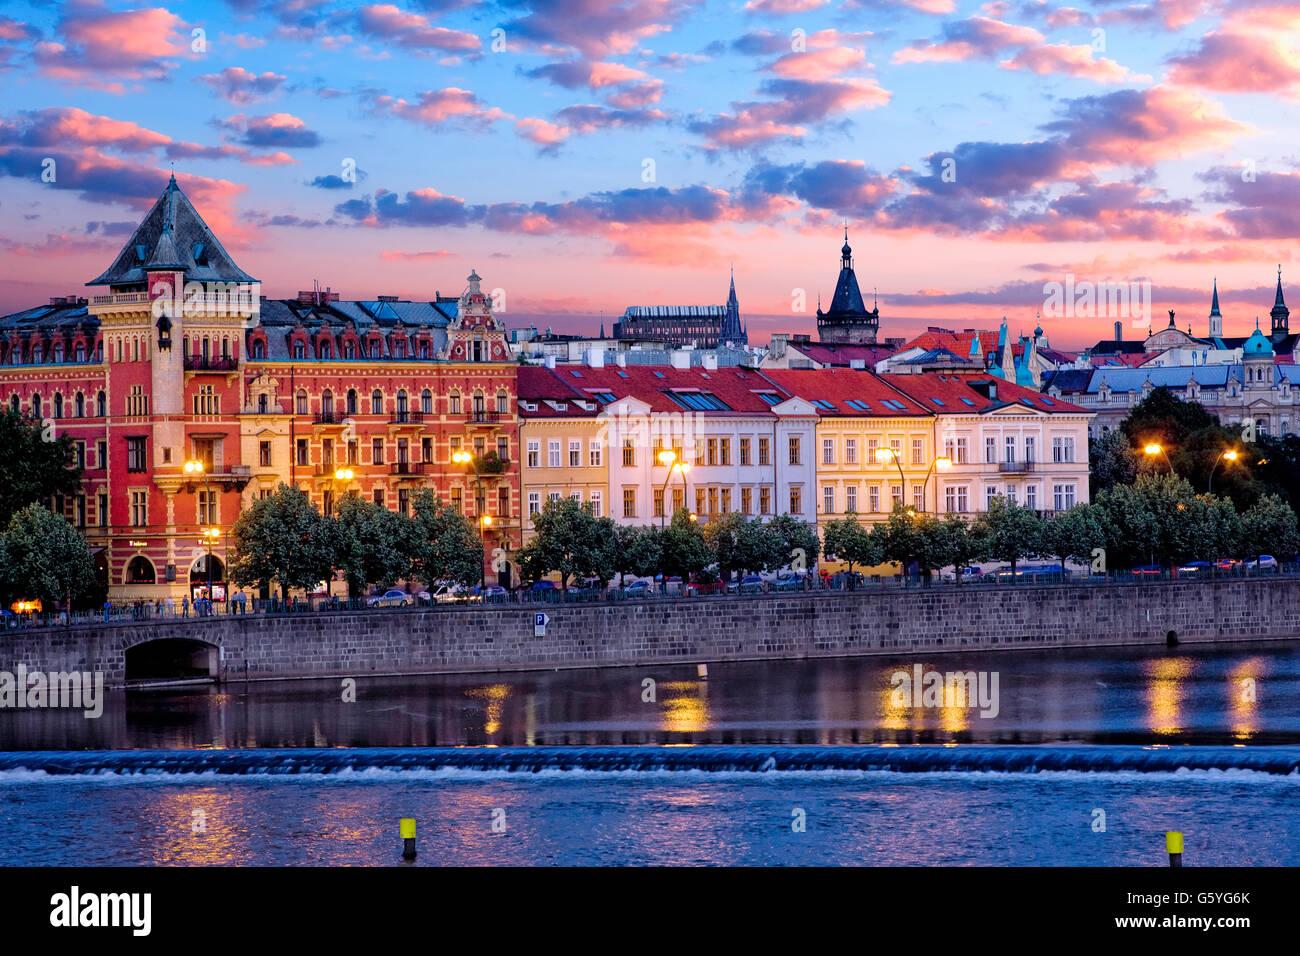 Vltava river and Prague skyline at night - Stock Image